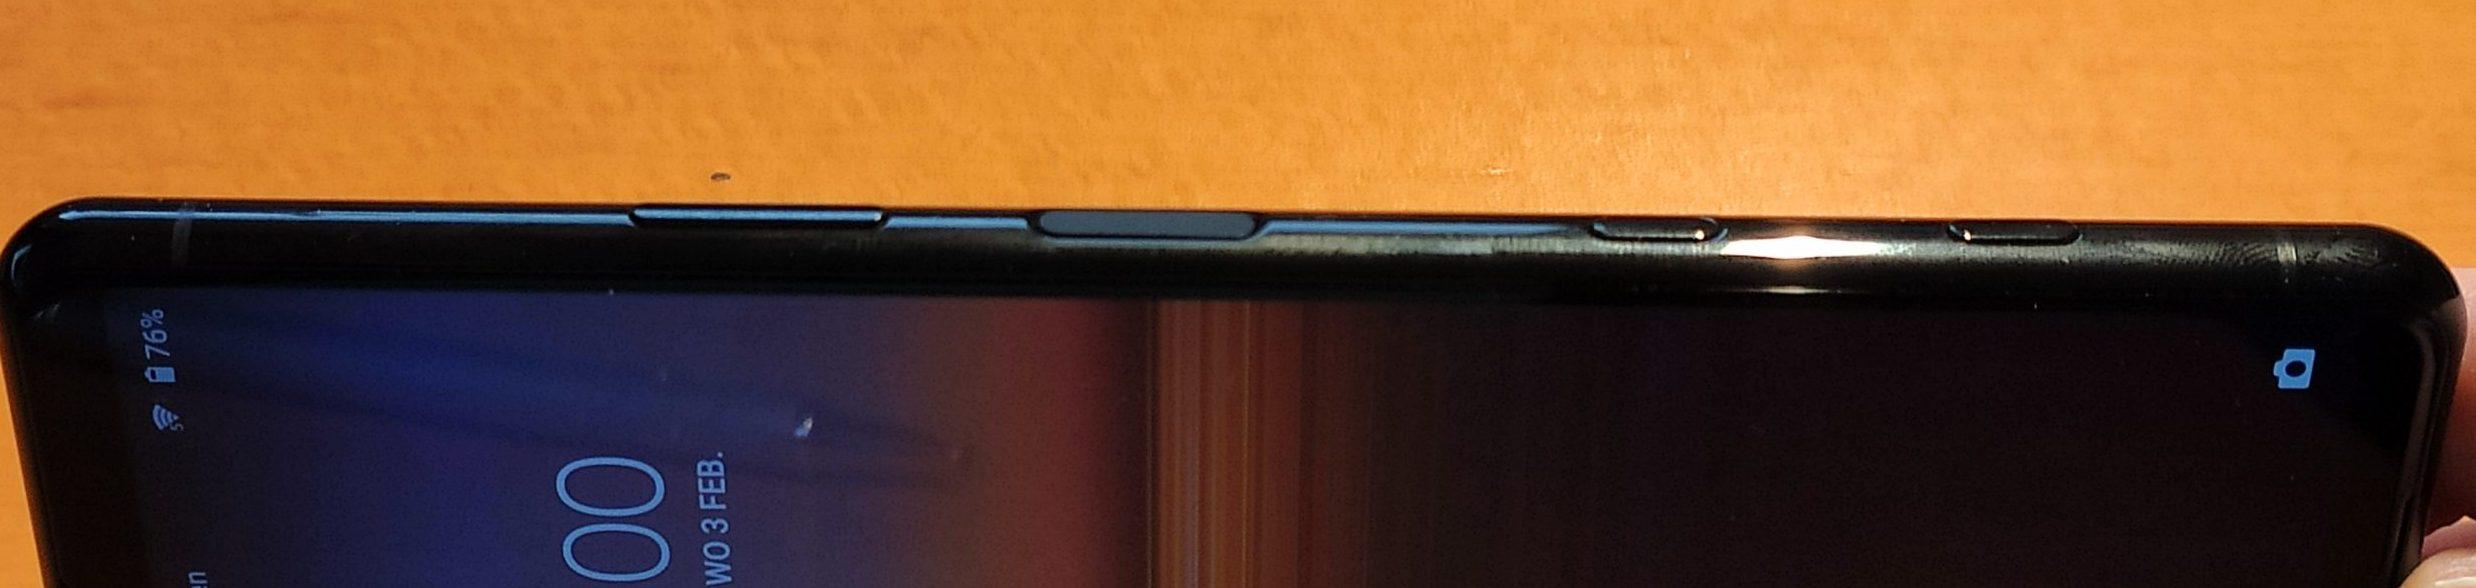 Xperia 5 II knoppen Google Assistent knop vingerafdrukscanner cameraknop